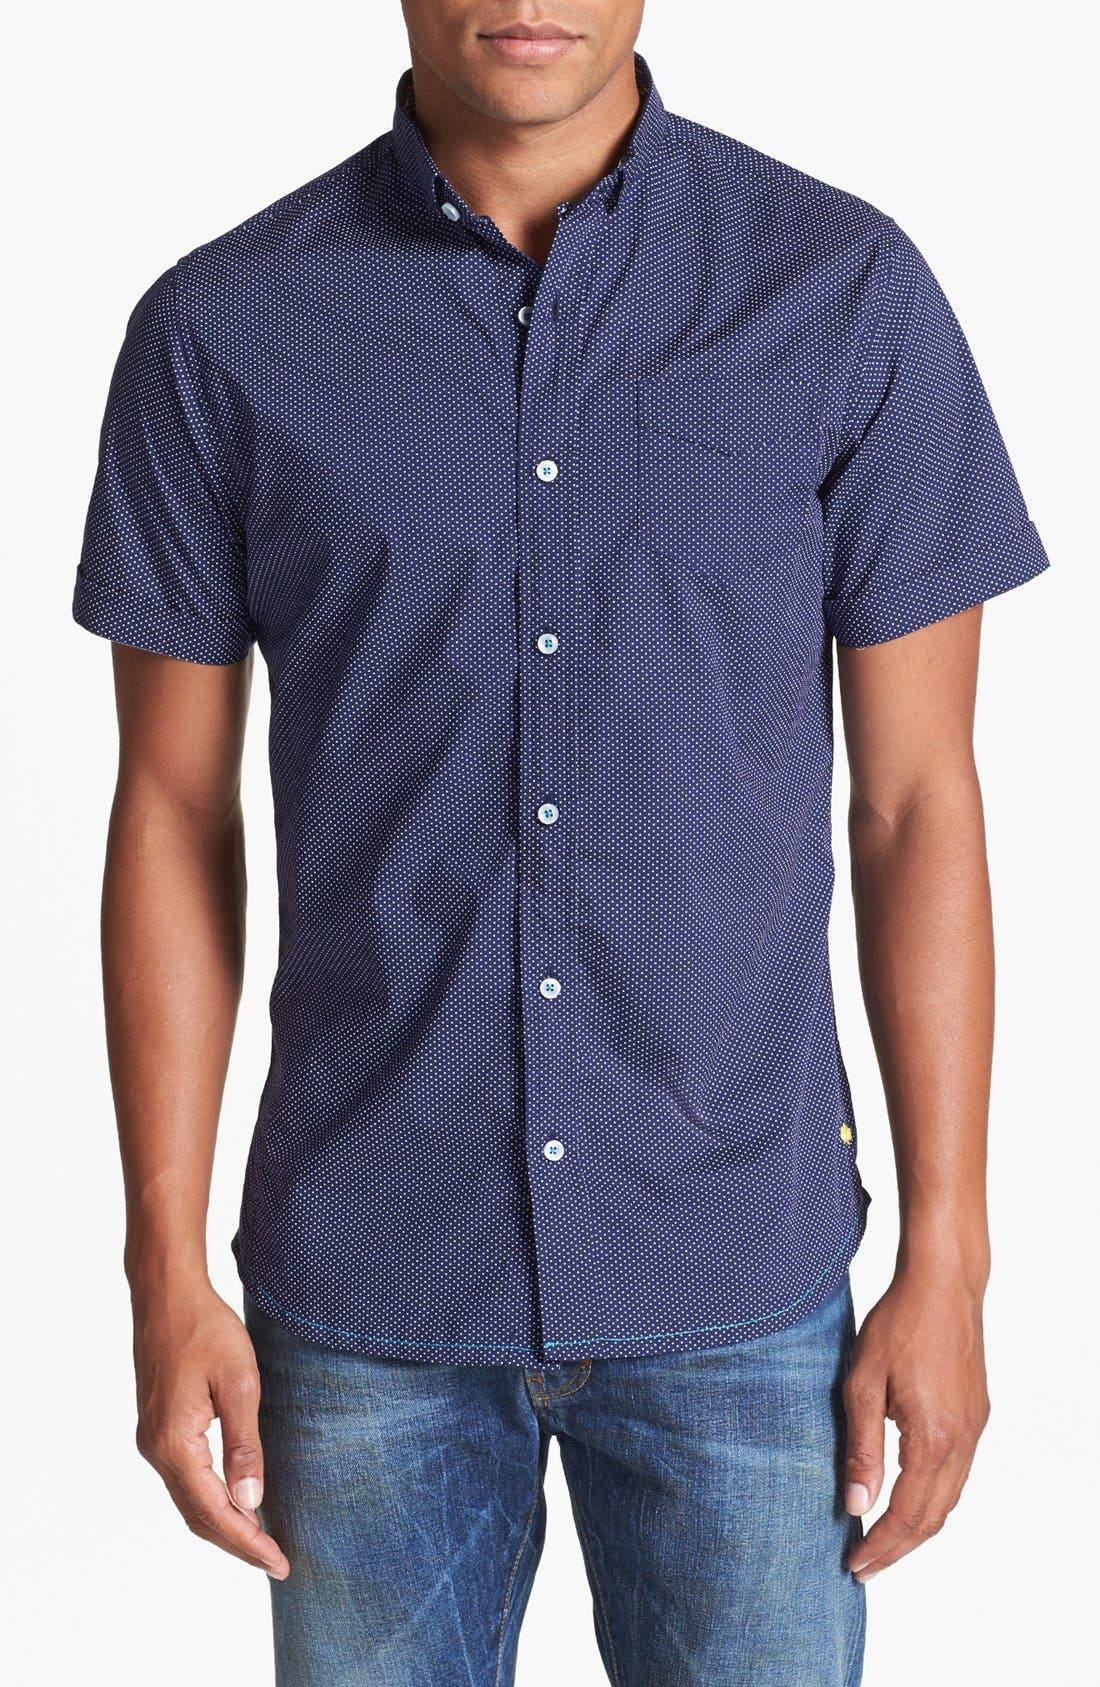 Main Image - Descendant of Thieves Dot Woven Shirt